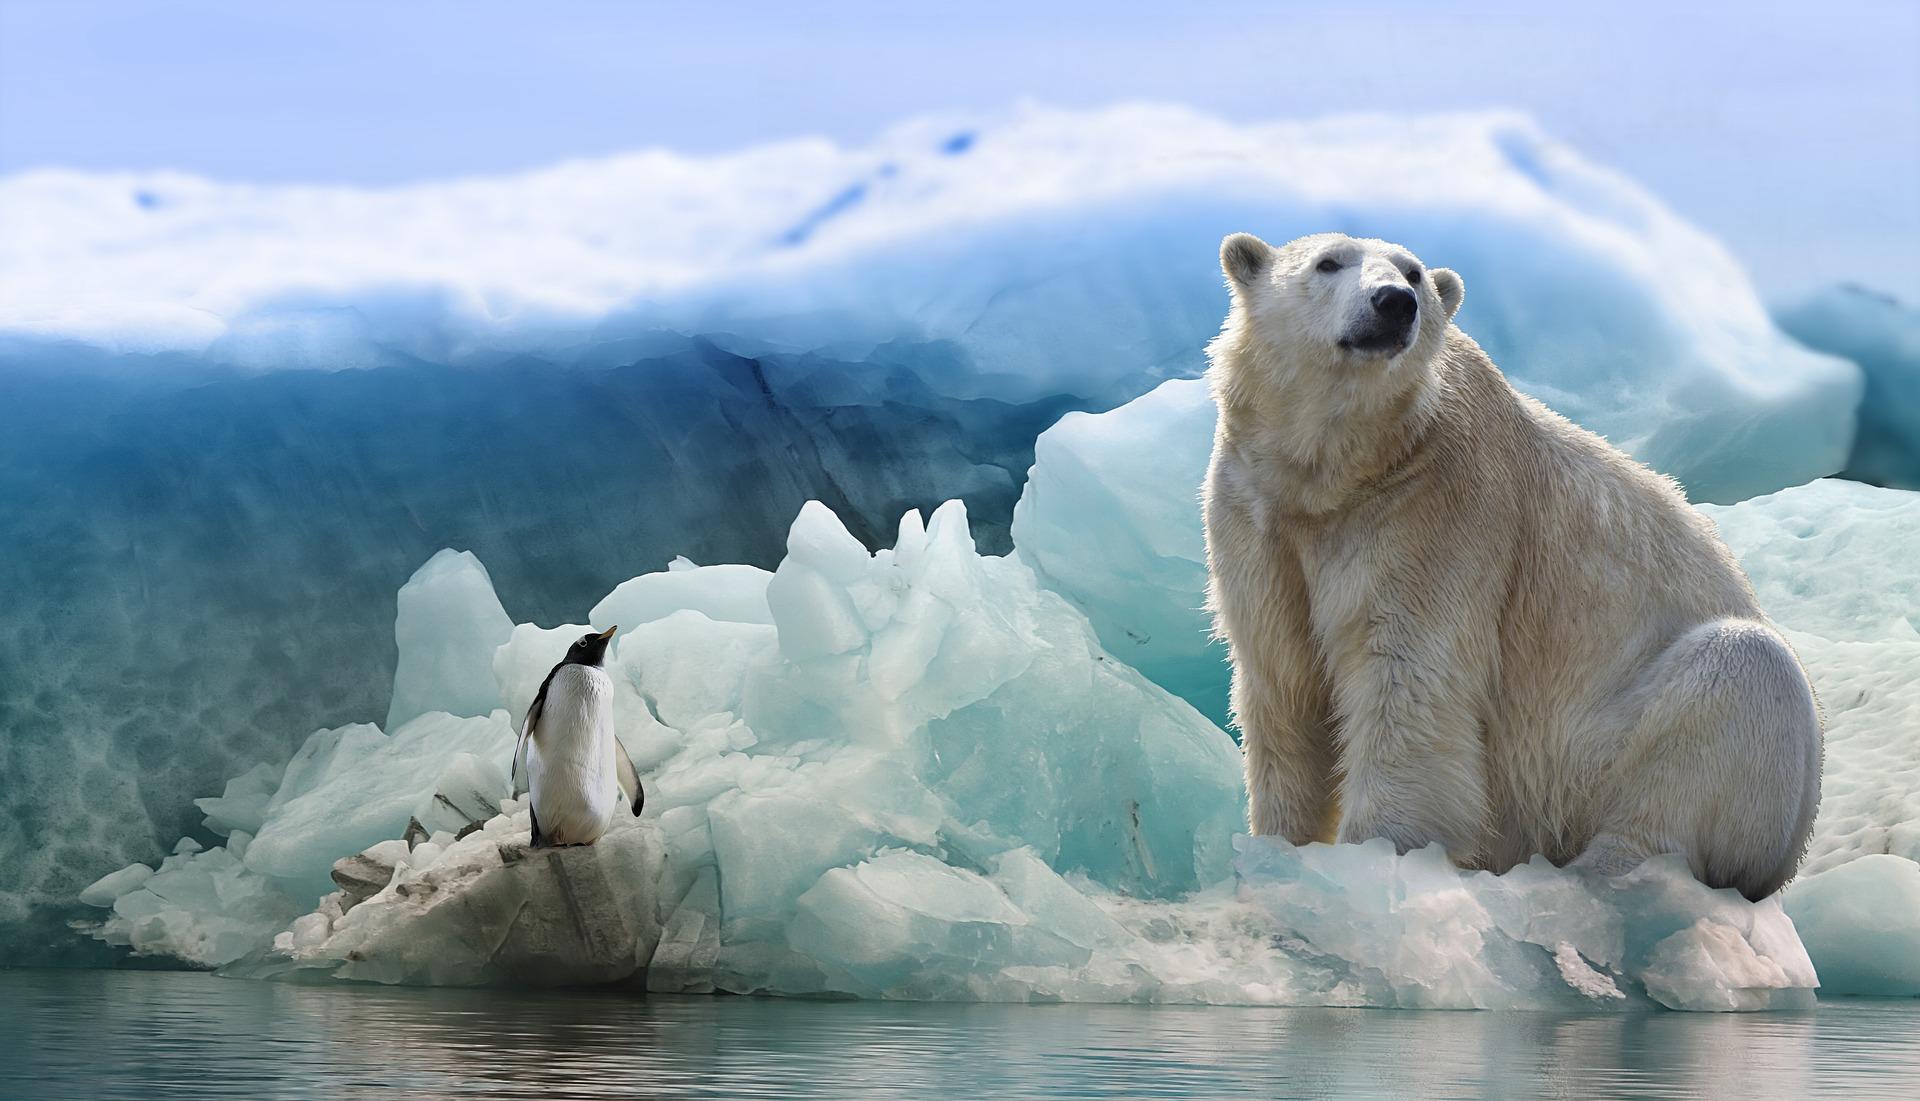 polar-bear-3277930_1920.jpg